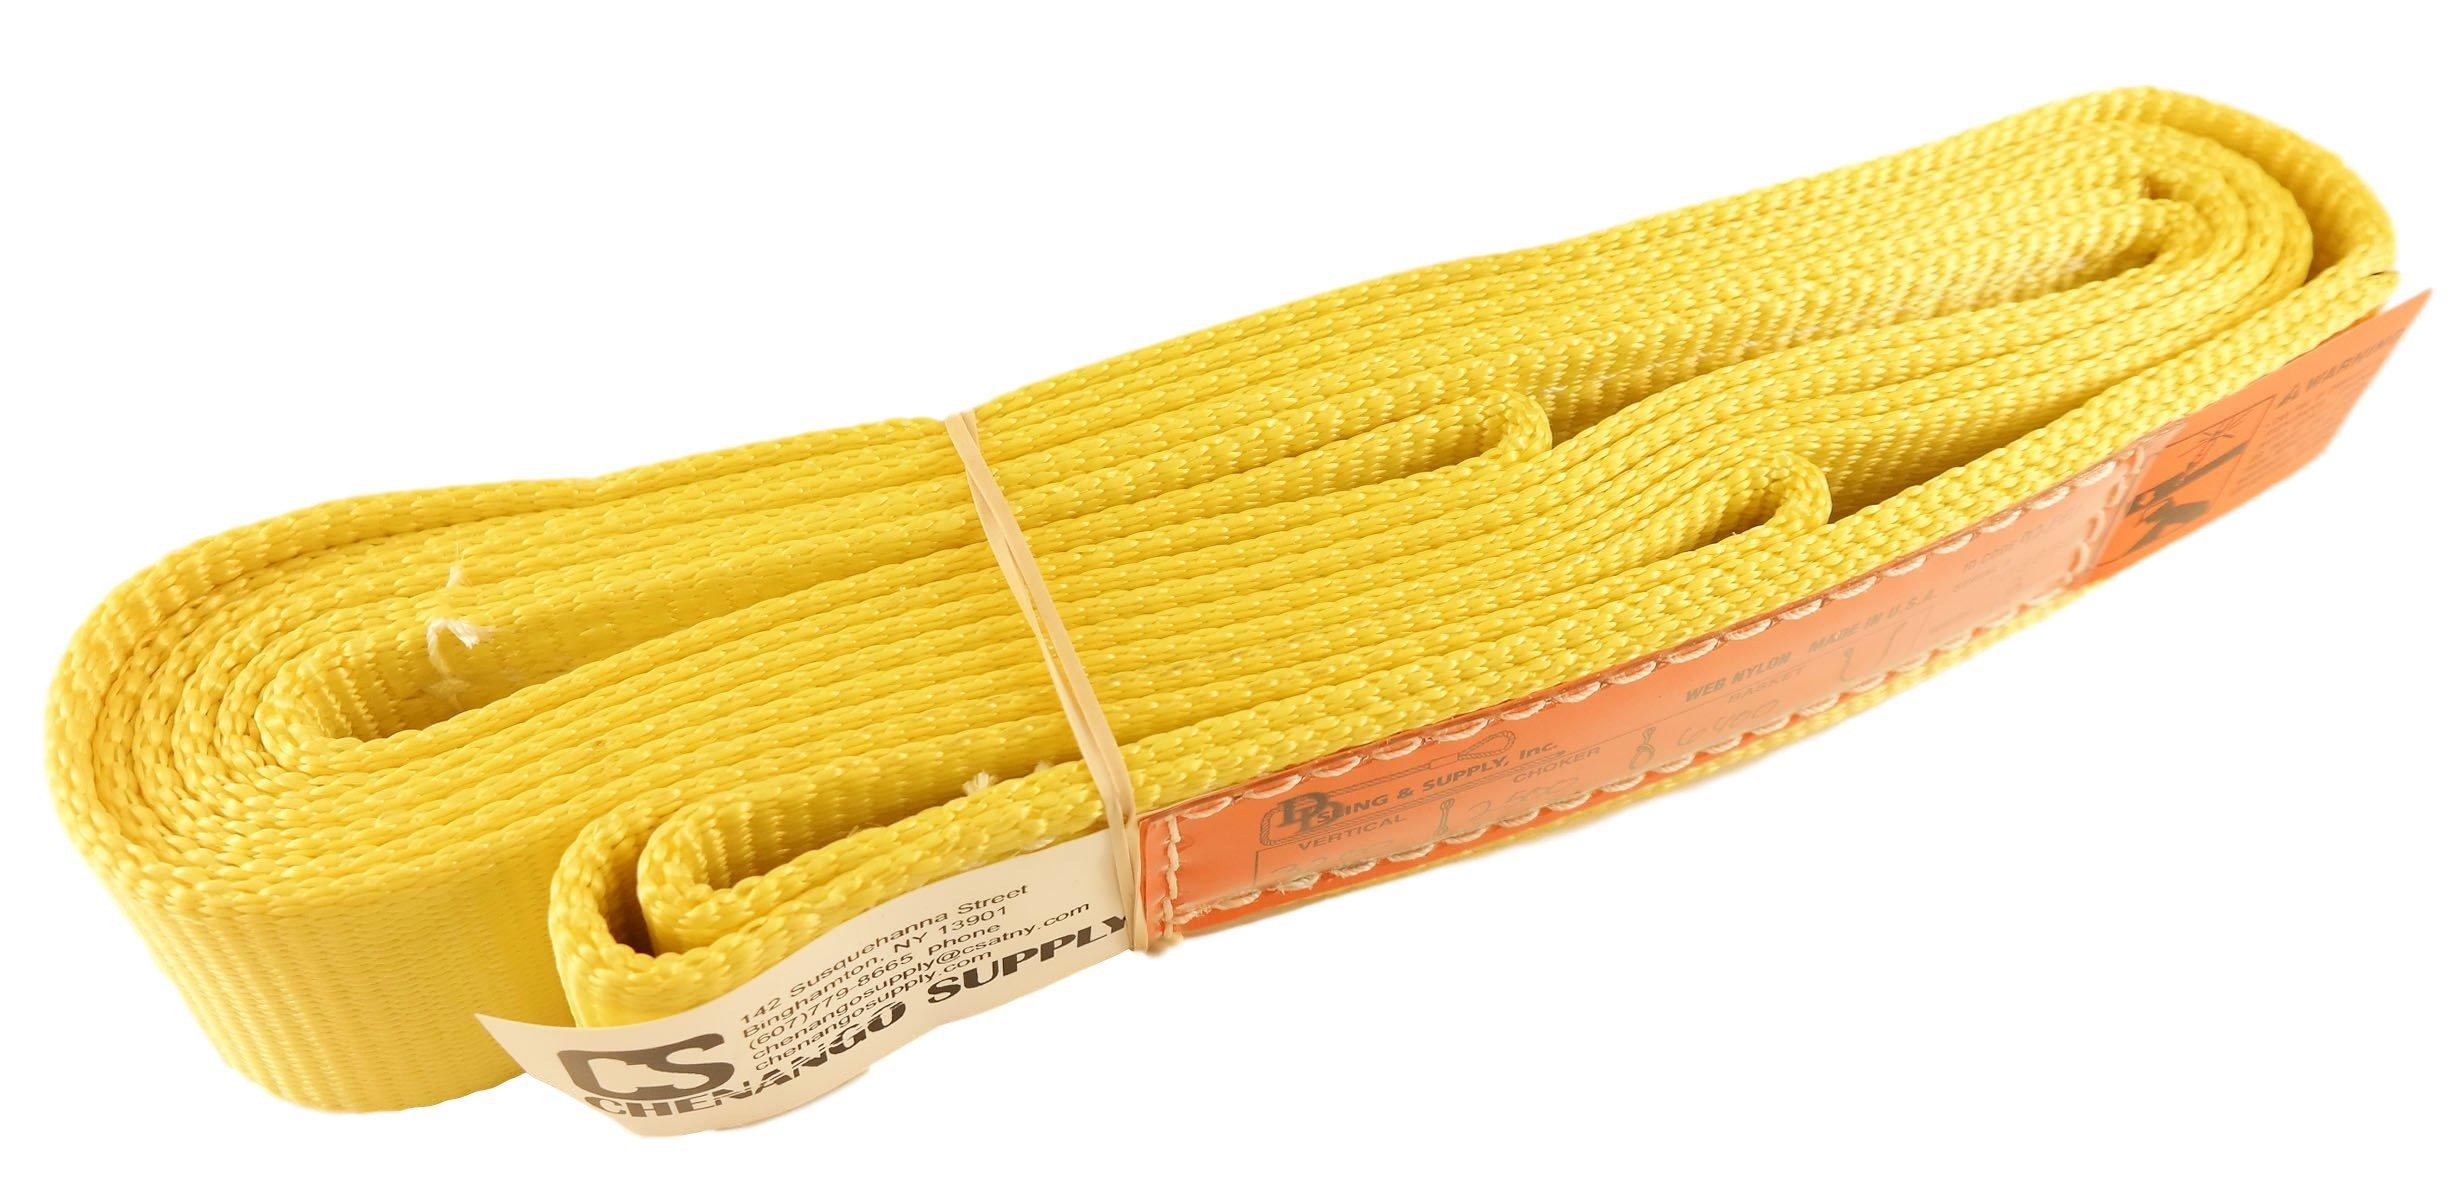 DD Sling. Multiple Lengths! (100% USA Made), 1-PLY, 2'' Wide Nylon Lifting Web Sling. 3,200lbs Vertical, 2,500lbs Choke, 6,400lbs Basket, Eye & Eye, Heavy Duty (900 webbing) (2''x12') by DD Sling & Supply, Inc.